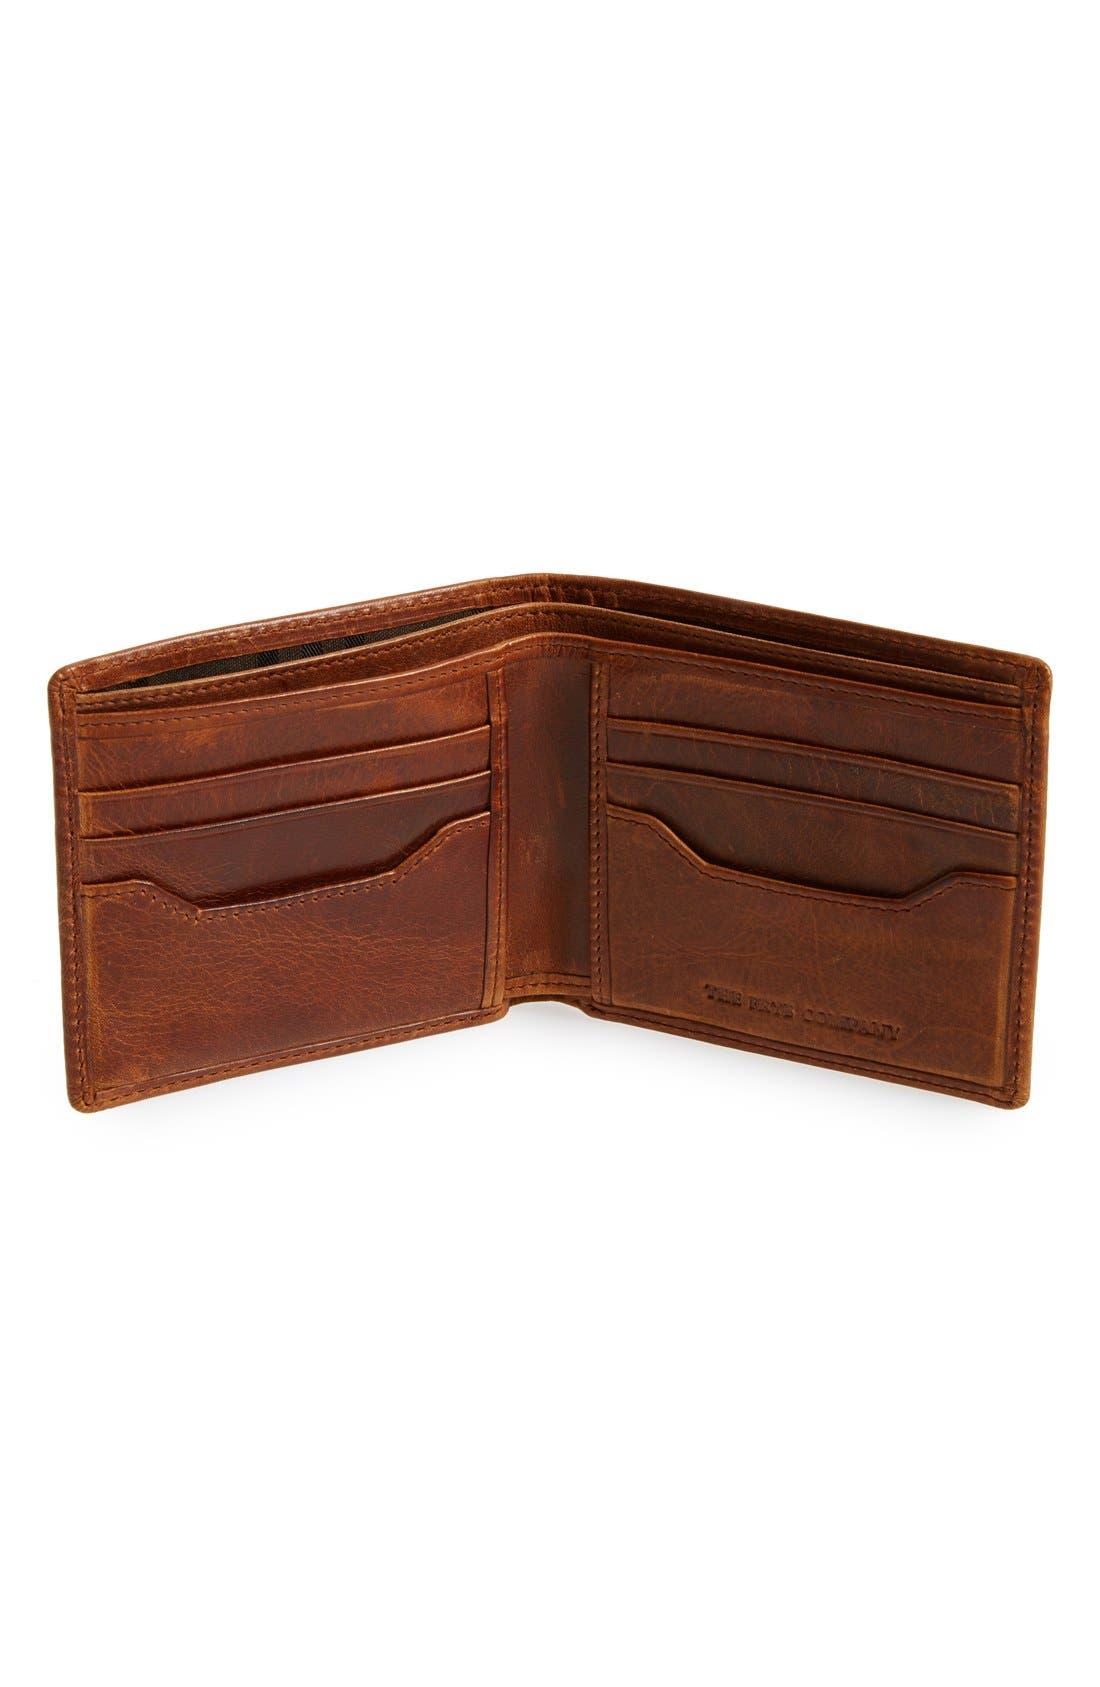 'Logan' Leather Billfold Wallet,                             Alternate thumbnail 2, color,                             COGNAC